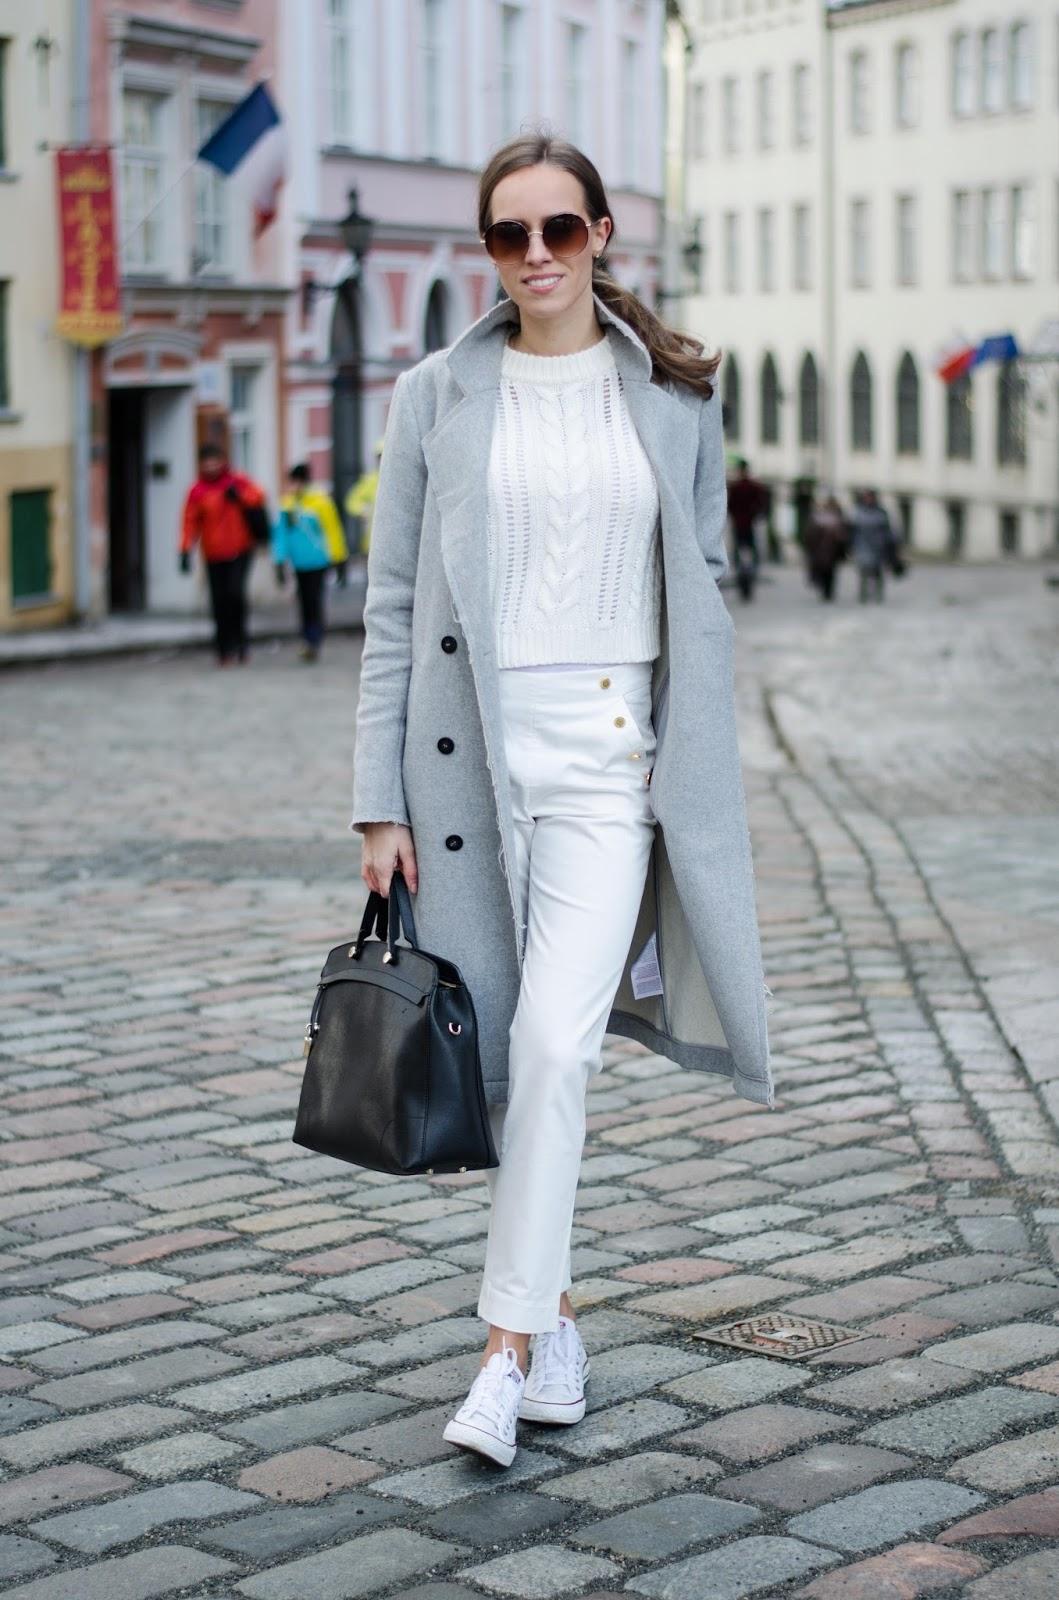 kristjaana mere spring white outfit marine pants cropped sweater wool coat converse sneakers